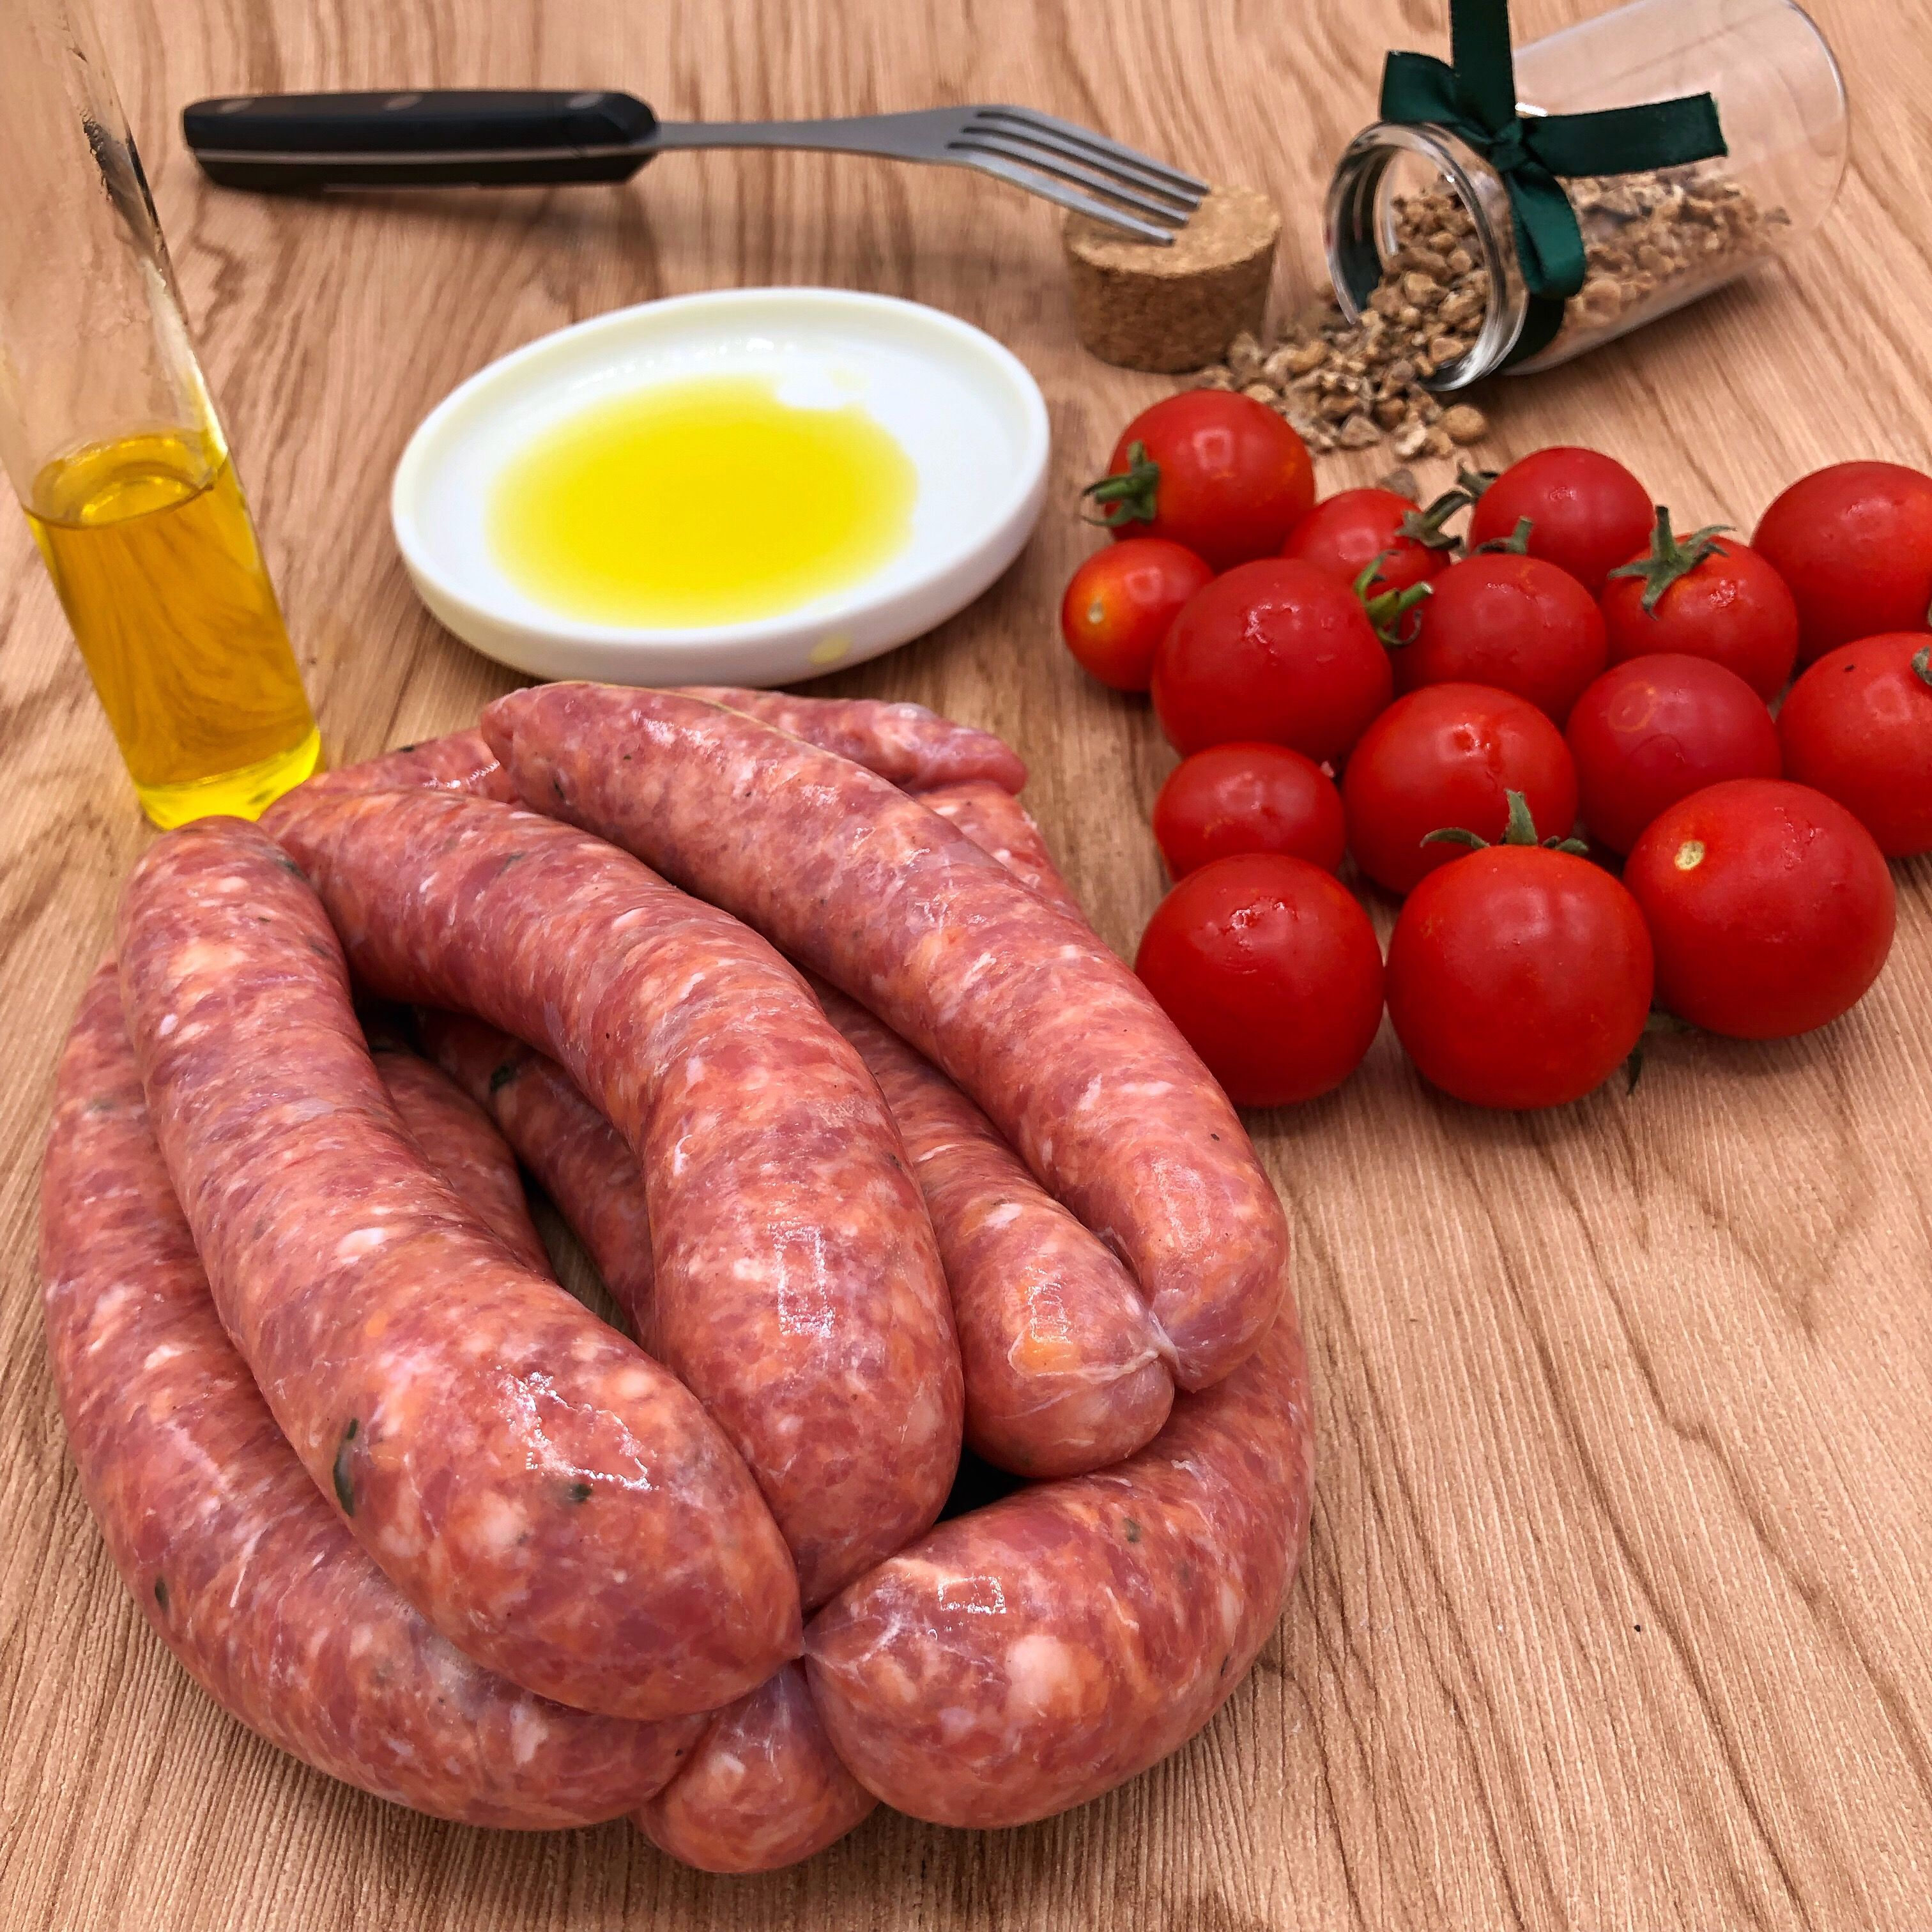 53ab0f6eb2a8faad15af9c75f3bbca75 - Salsiccetta Ricette